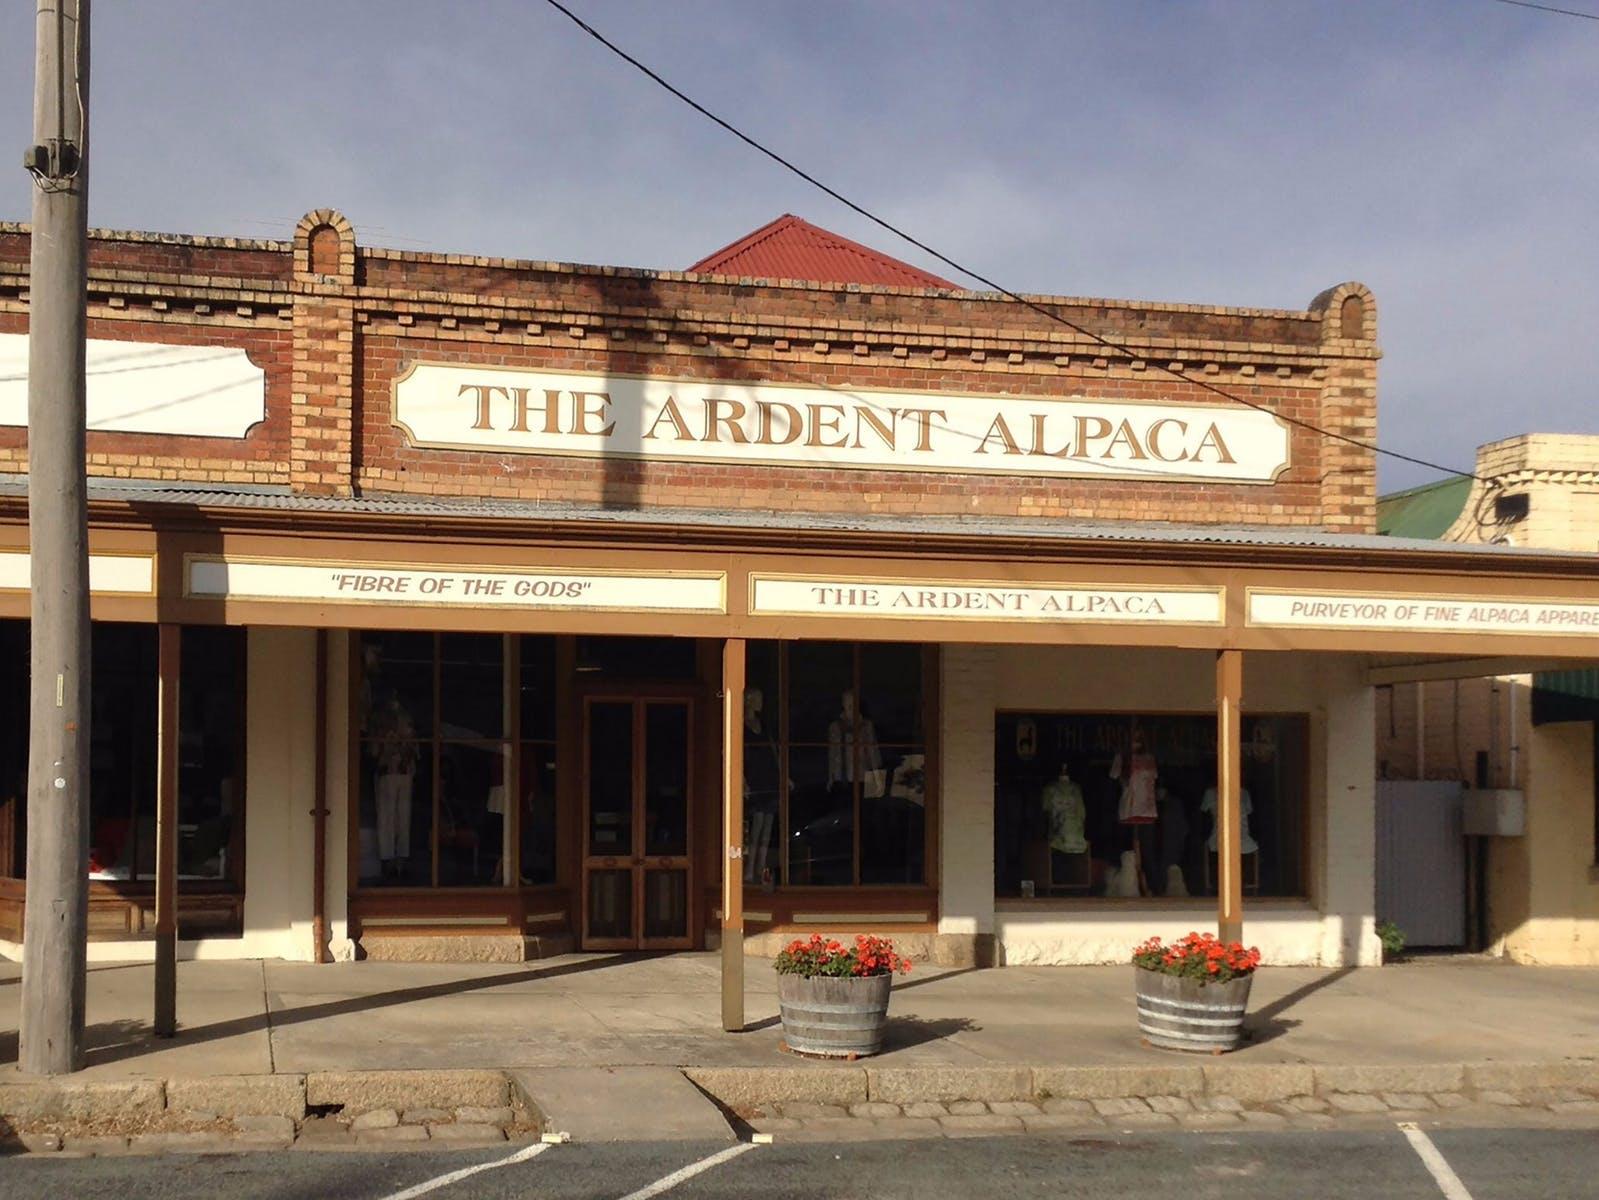 The Ardent Alpaca Store